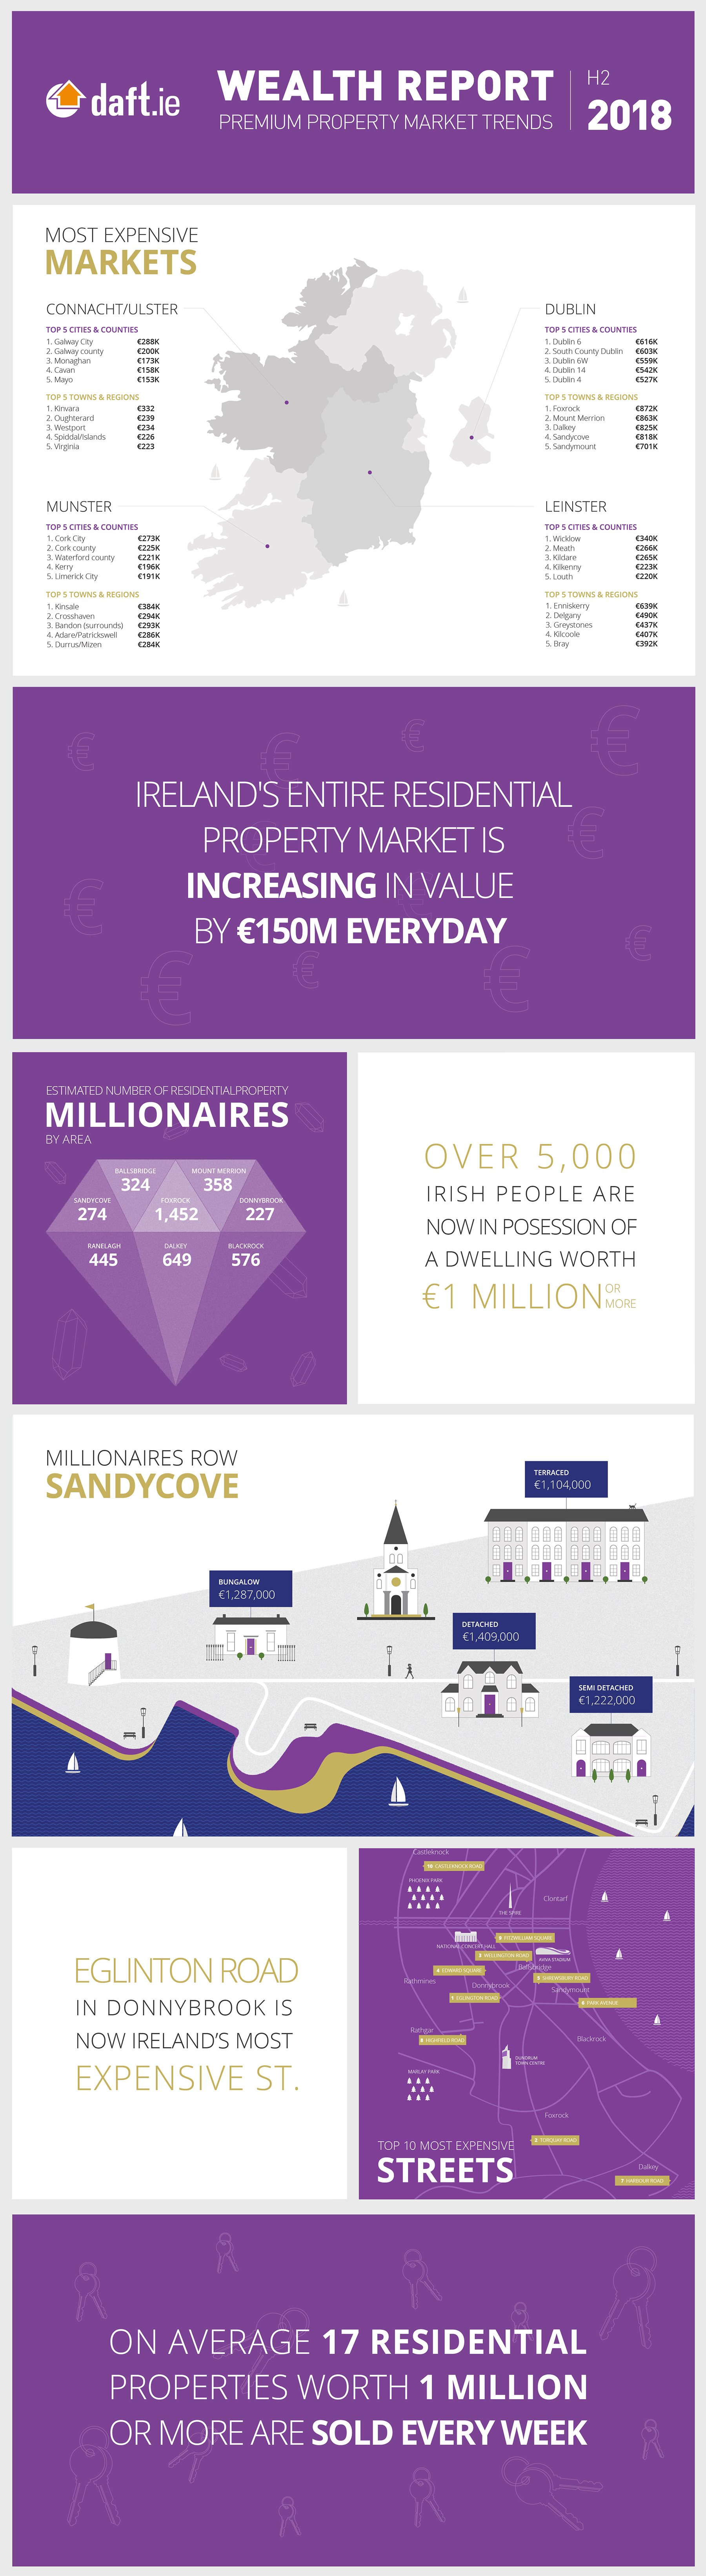 daft-wealth-report-Infographic.jpg